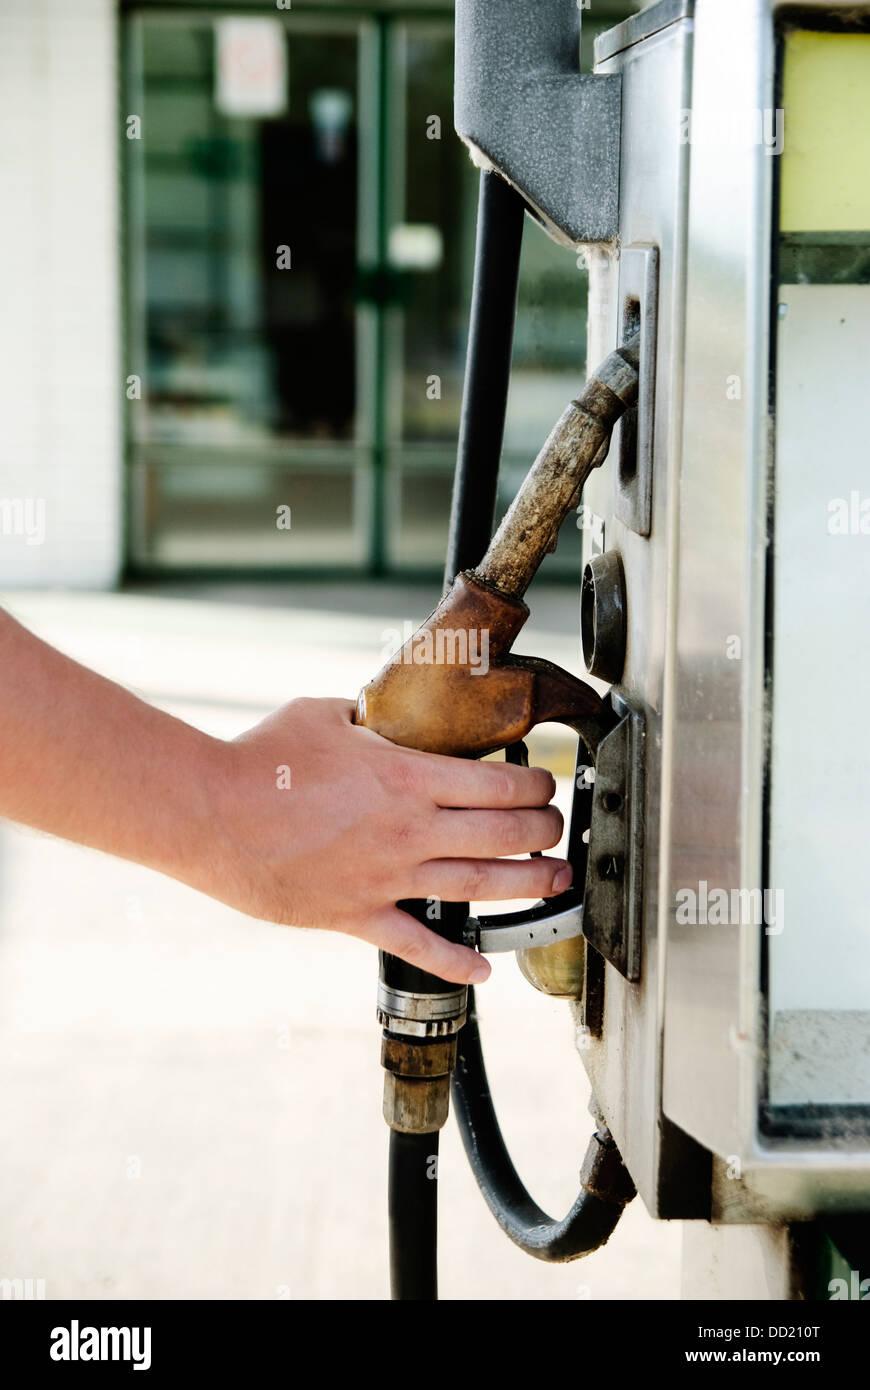 Mann Hand mit Kraftstoffpumpe Stockbild